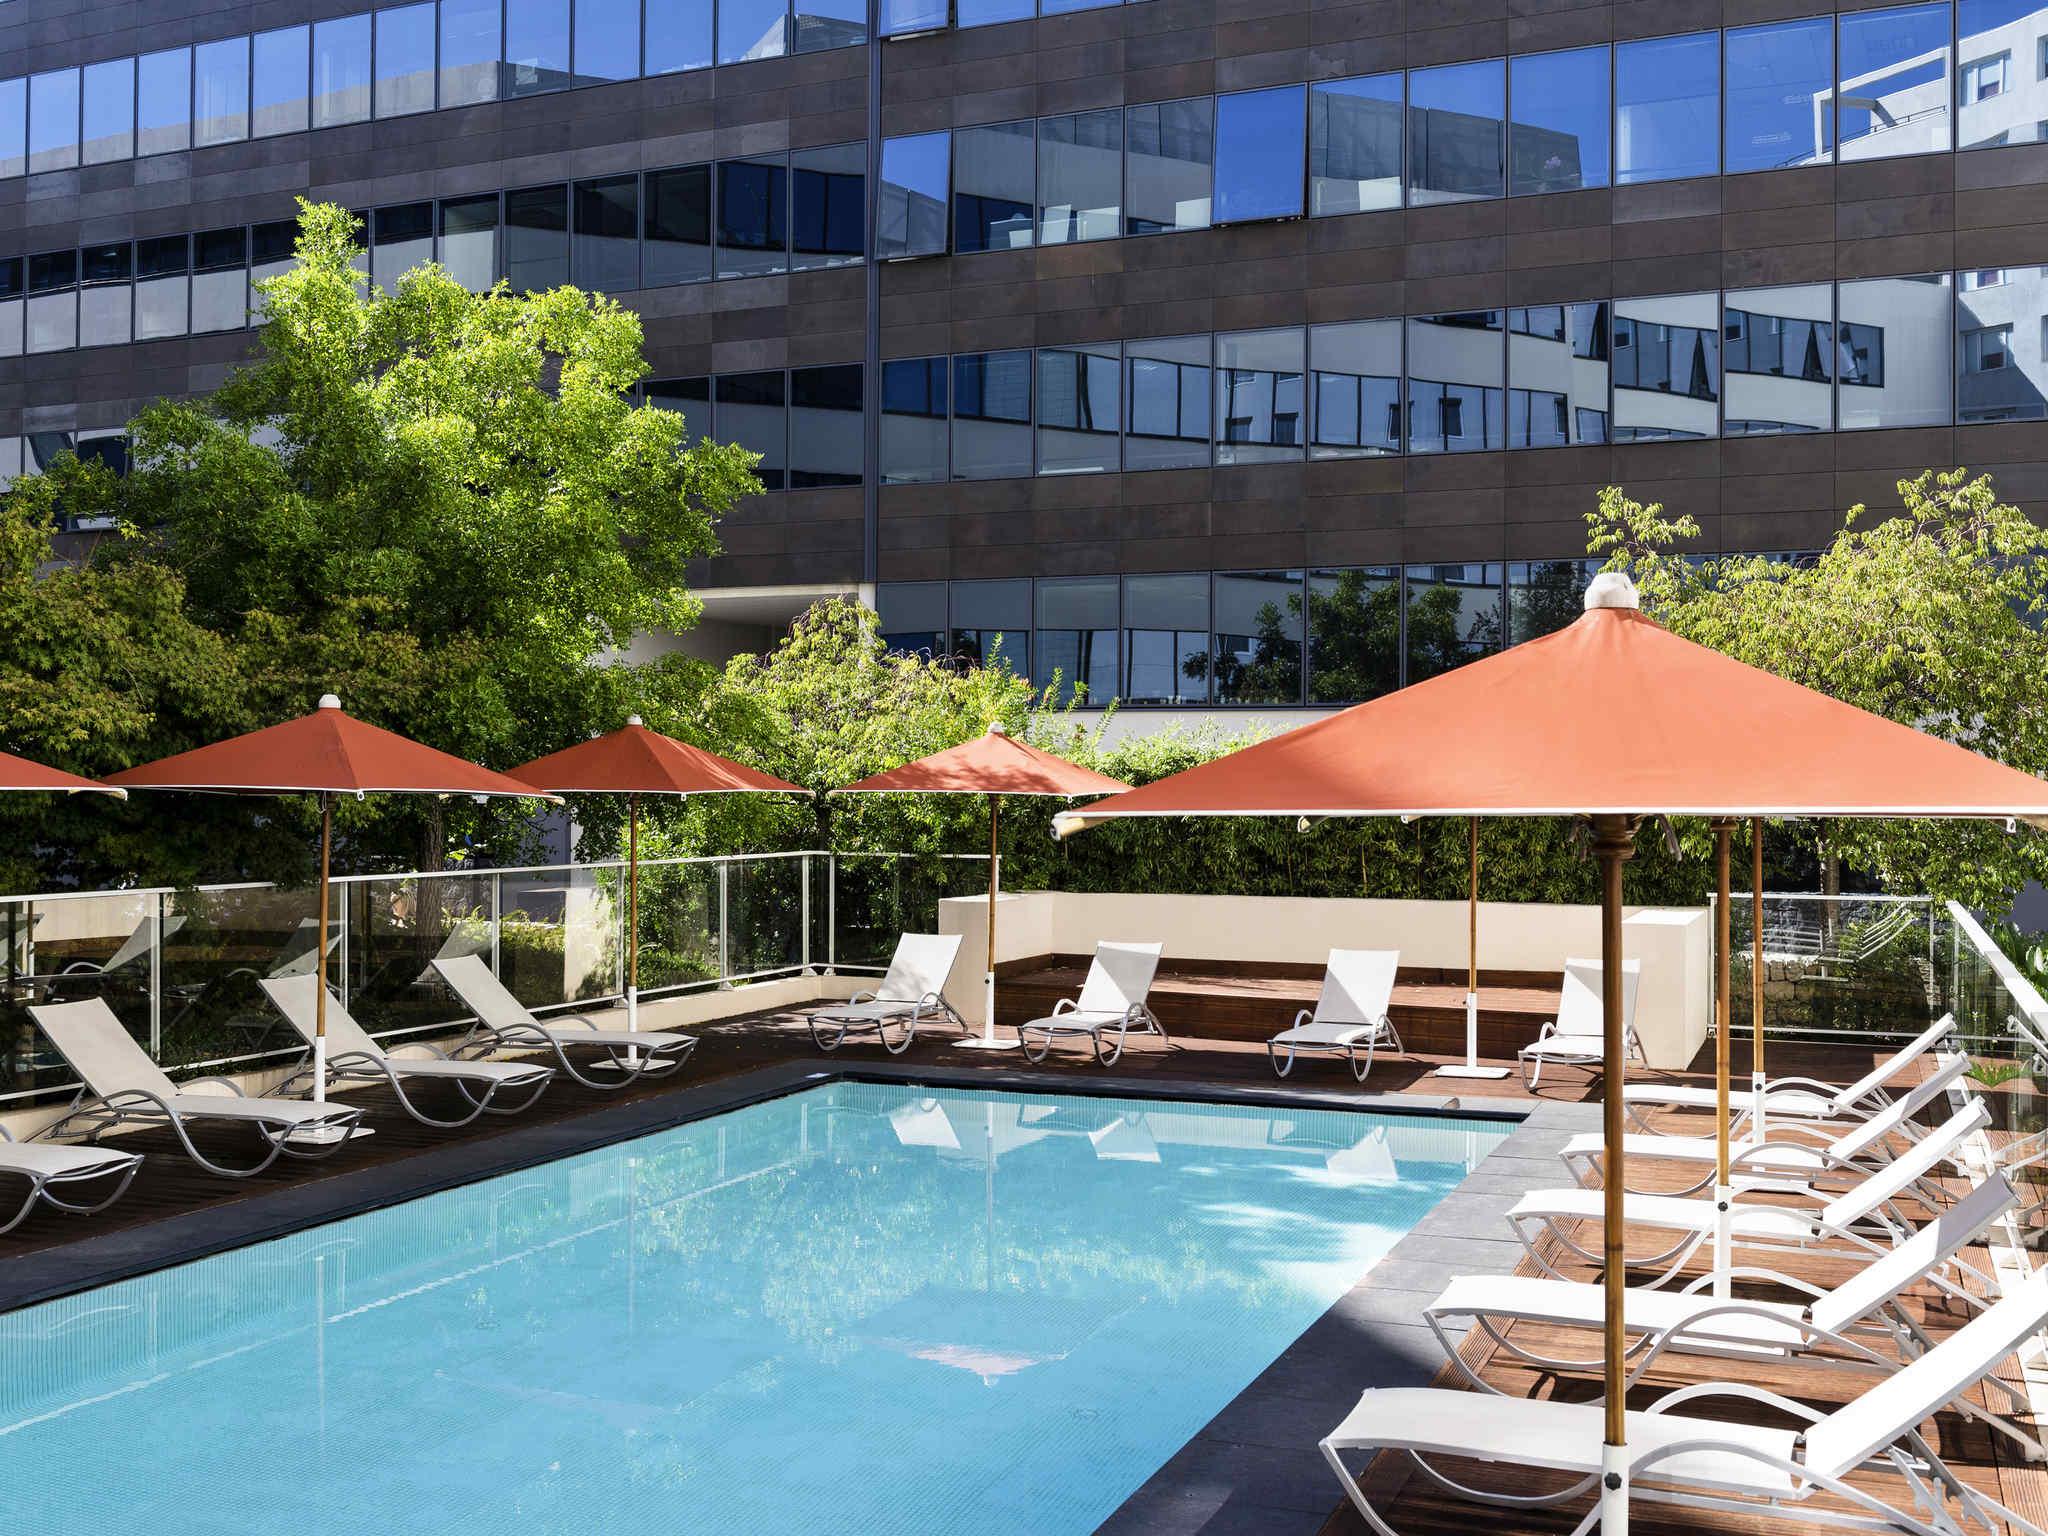 Hotel – Novotel Suites Nice Airport